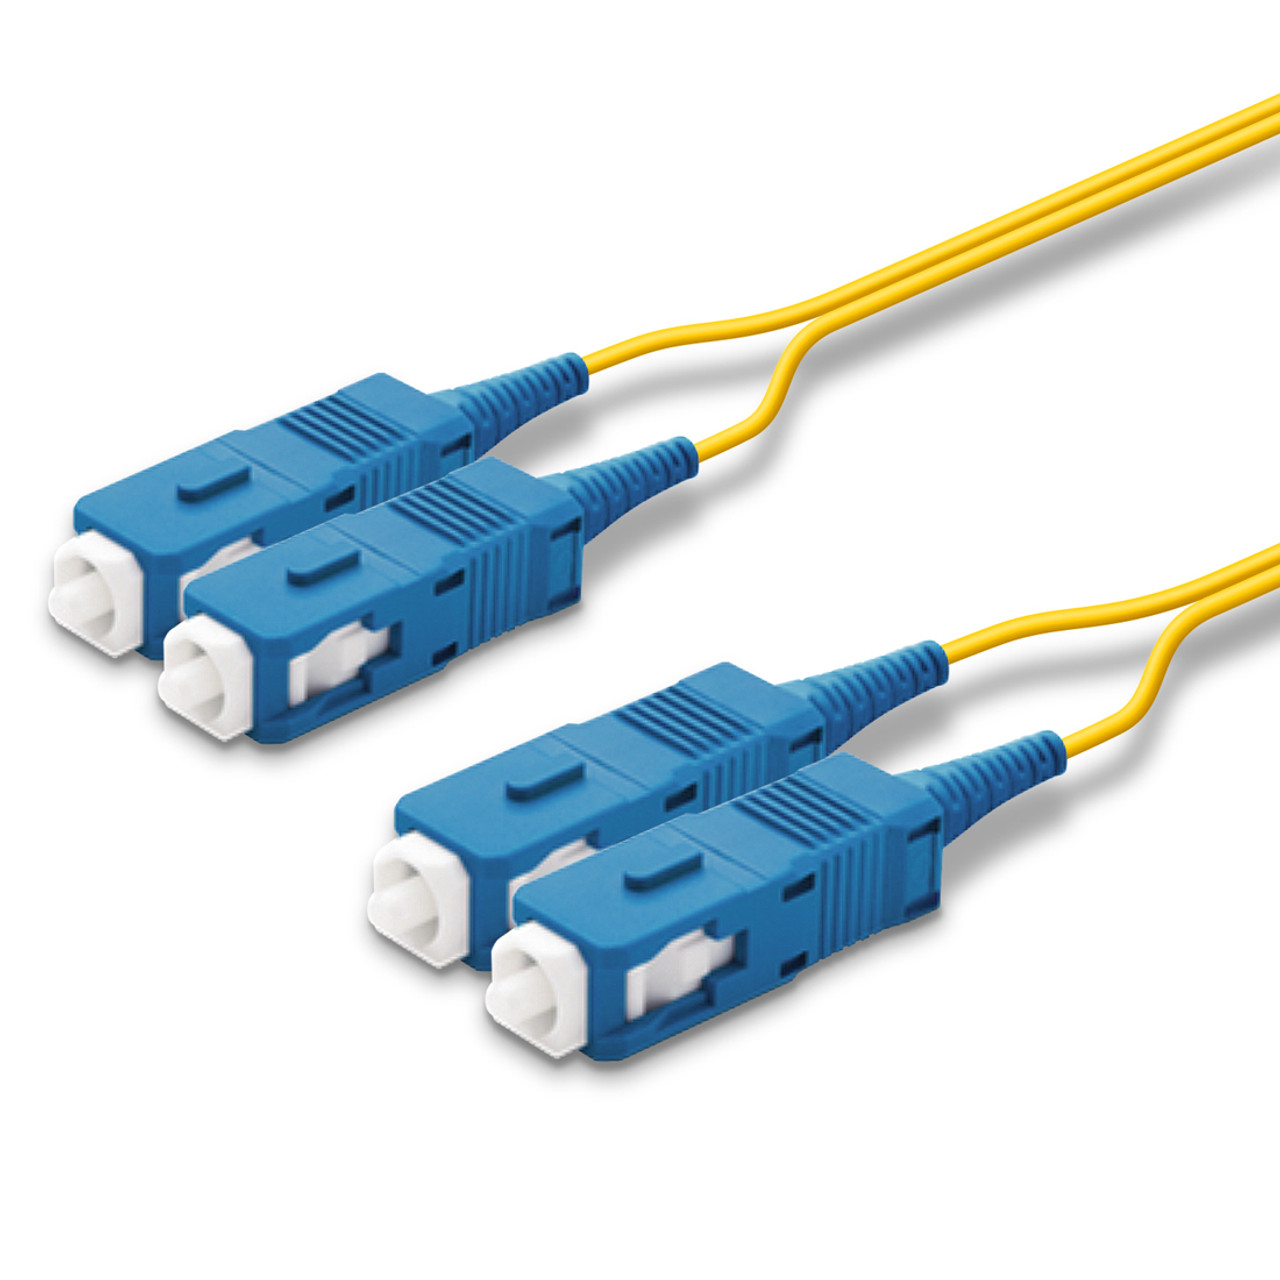 2 SC Duplex connectors, blue